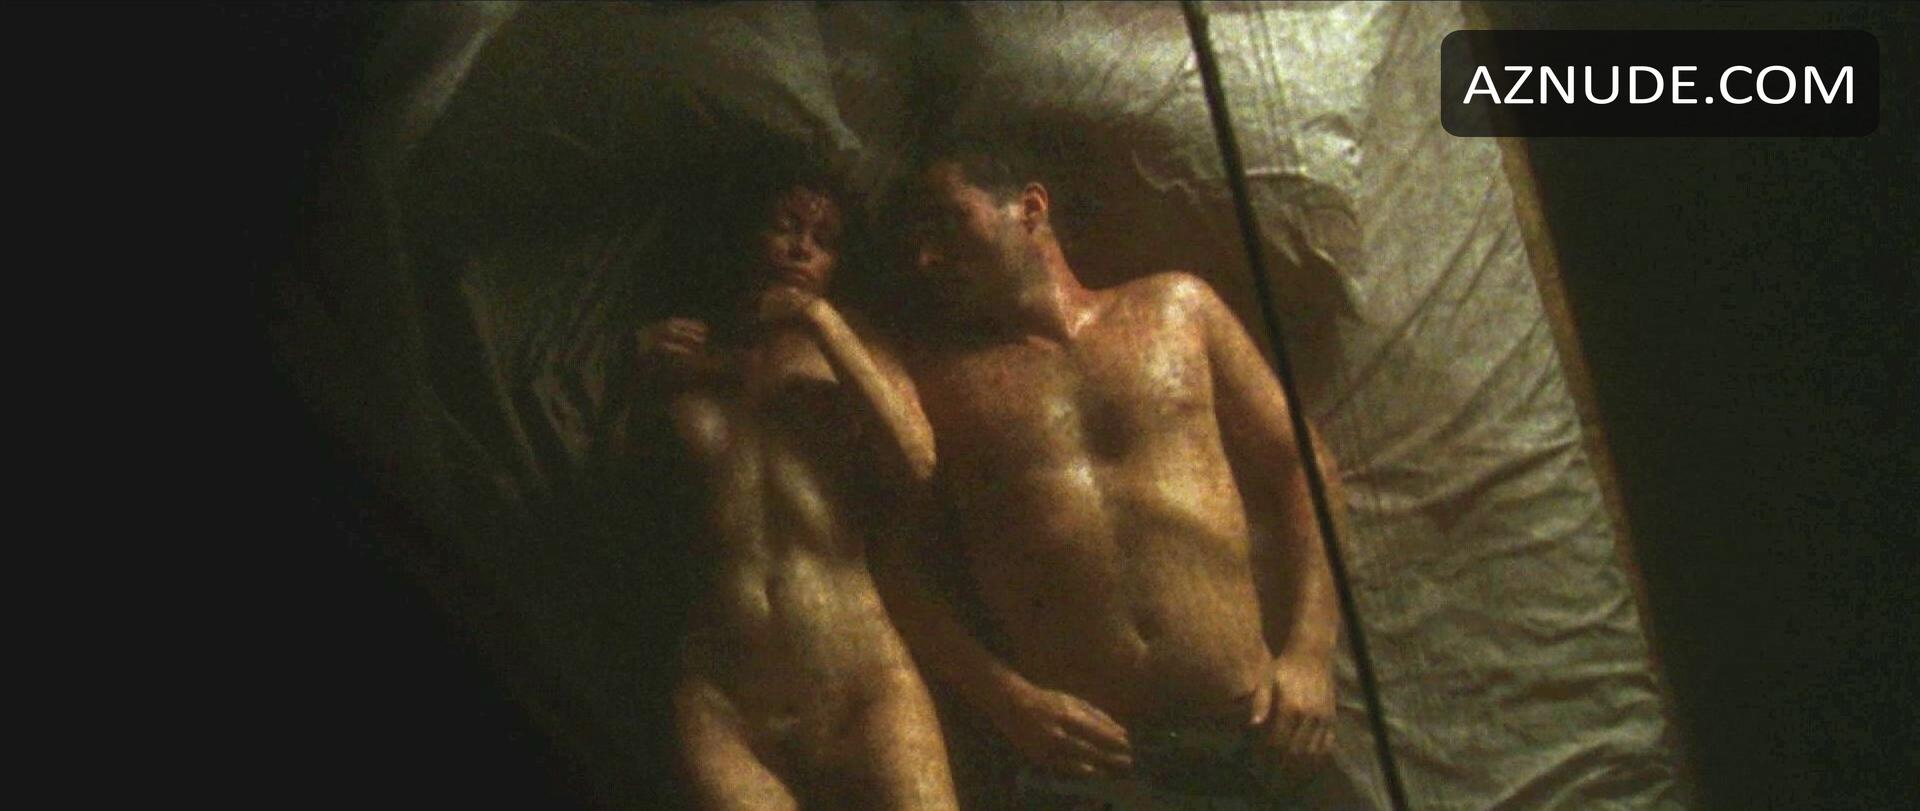 Vinyan nude pics